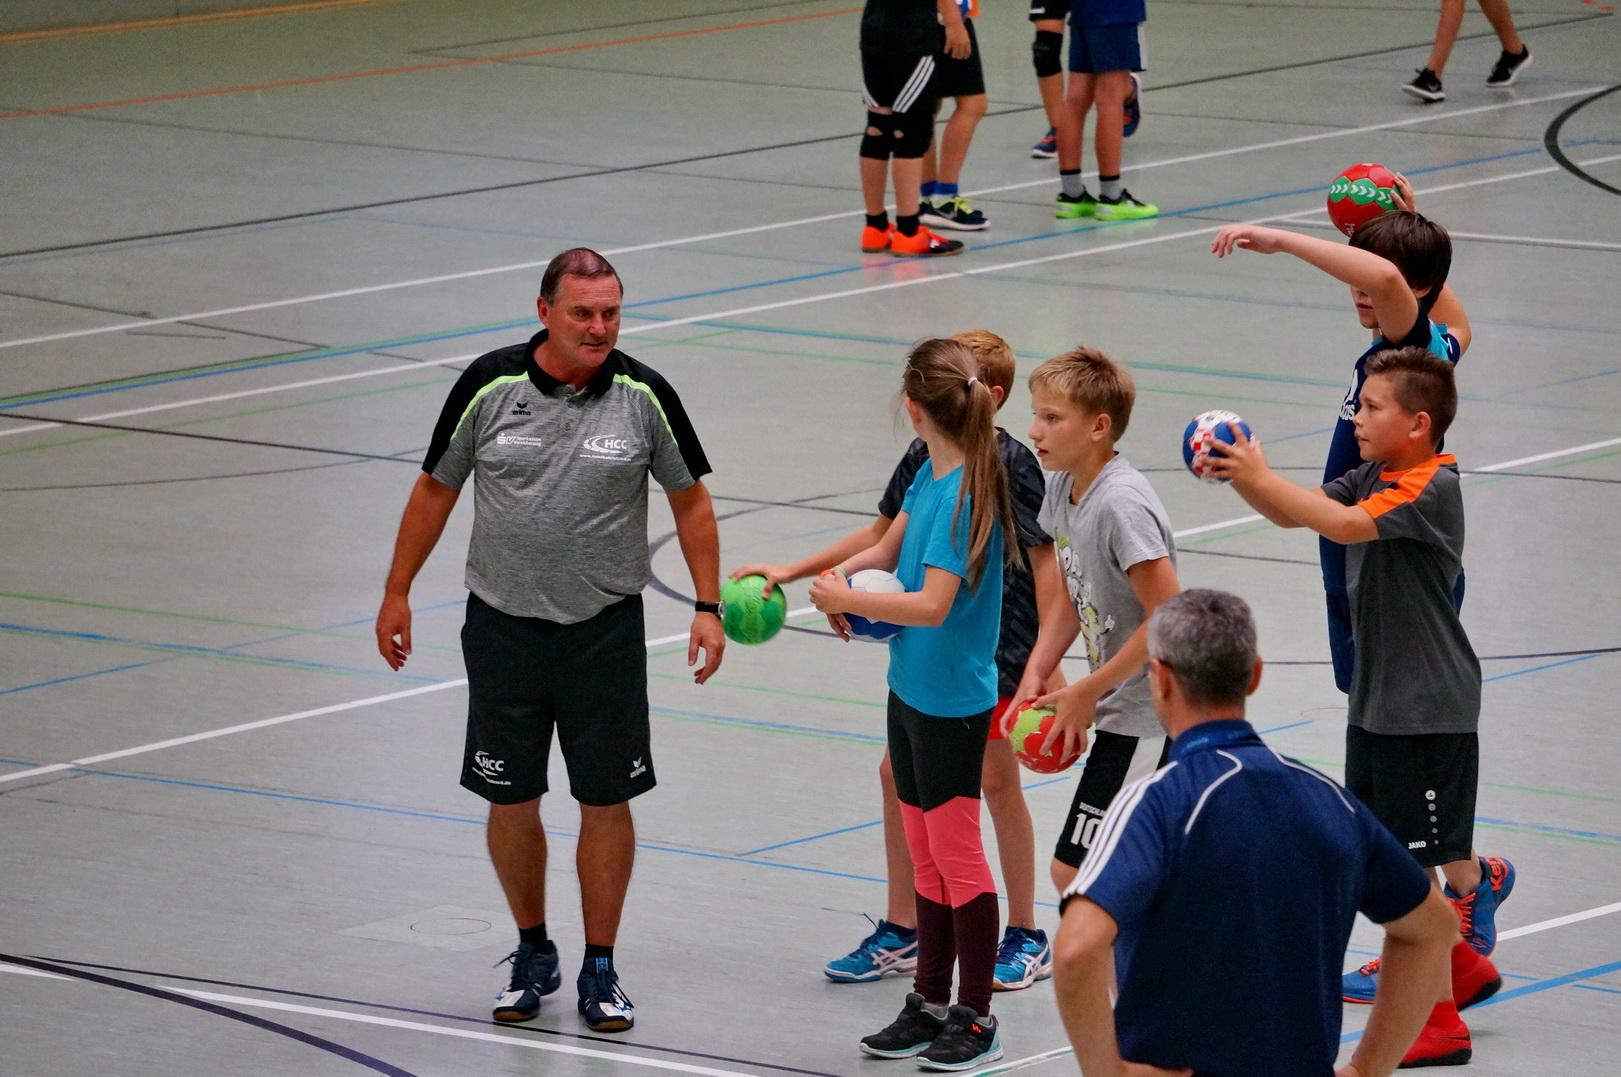 201808_Handballcamp_SDH_MG_091w